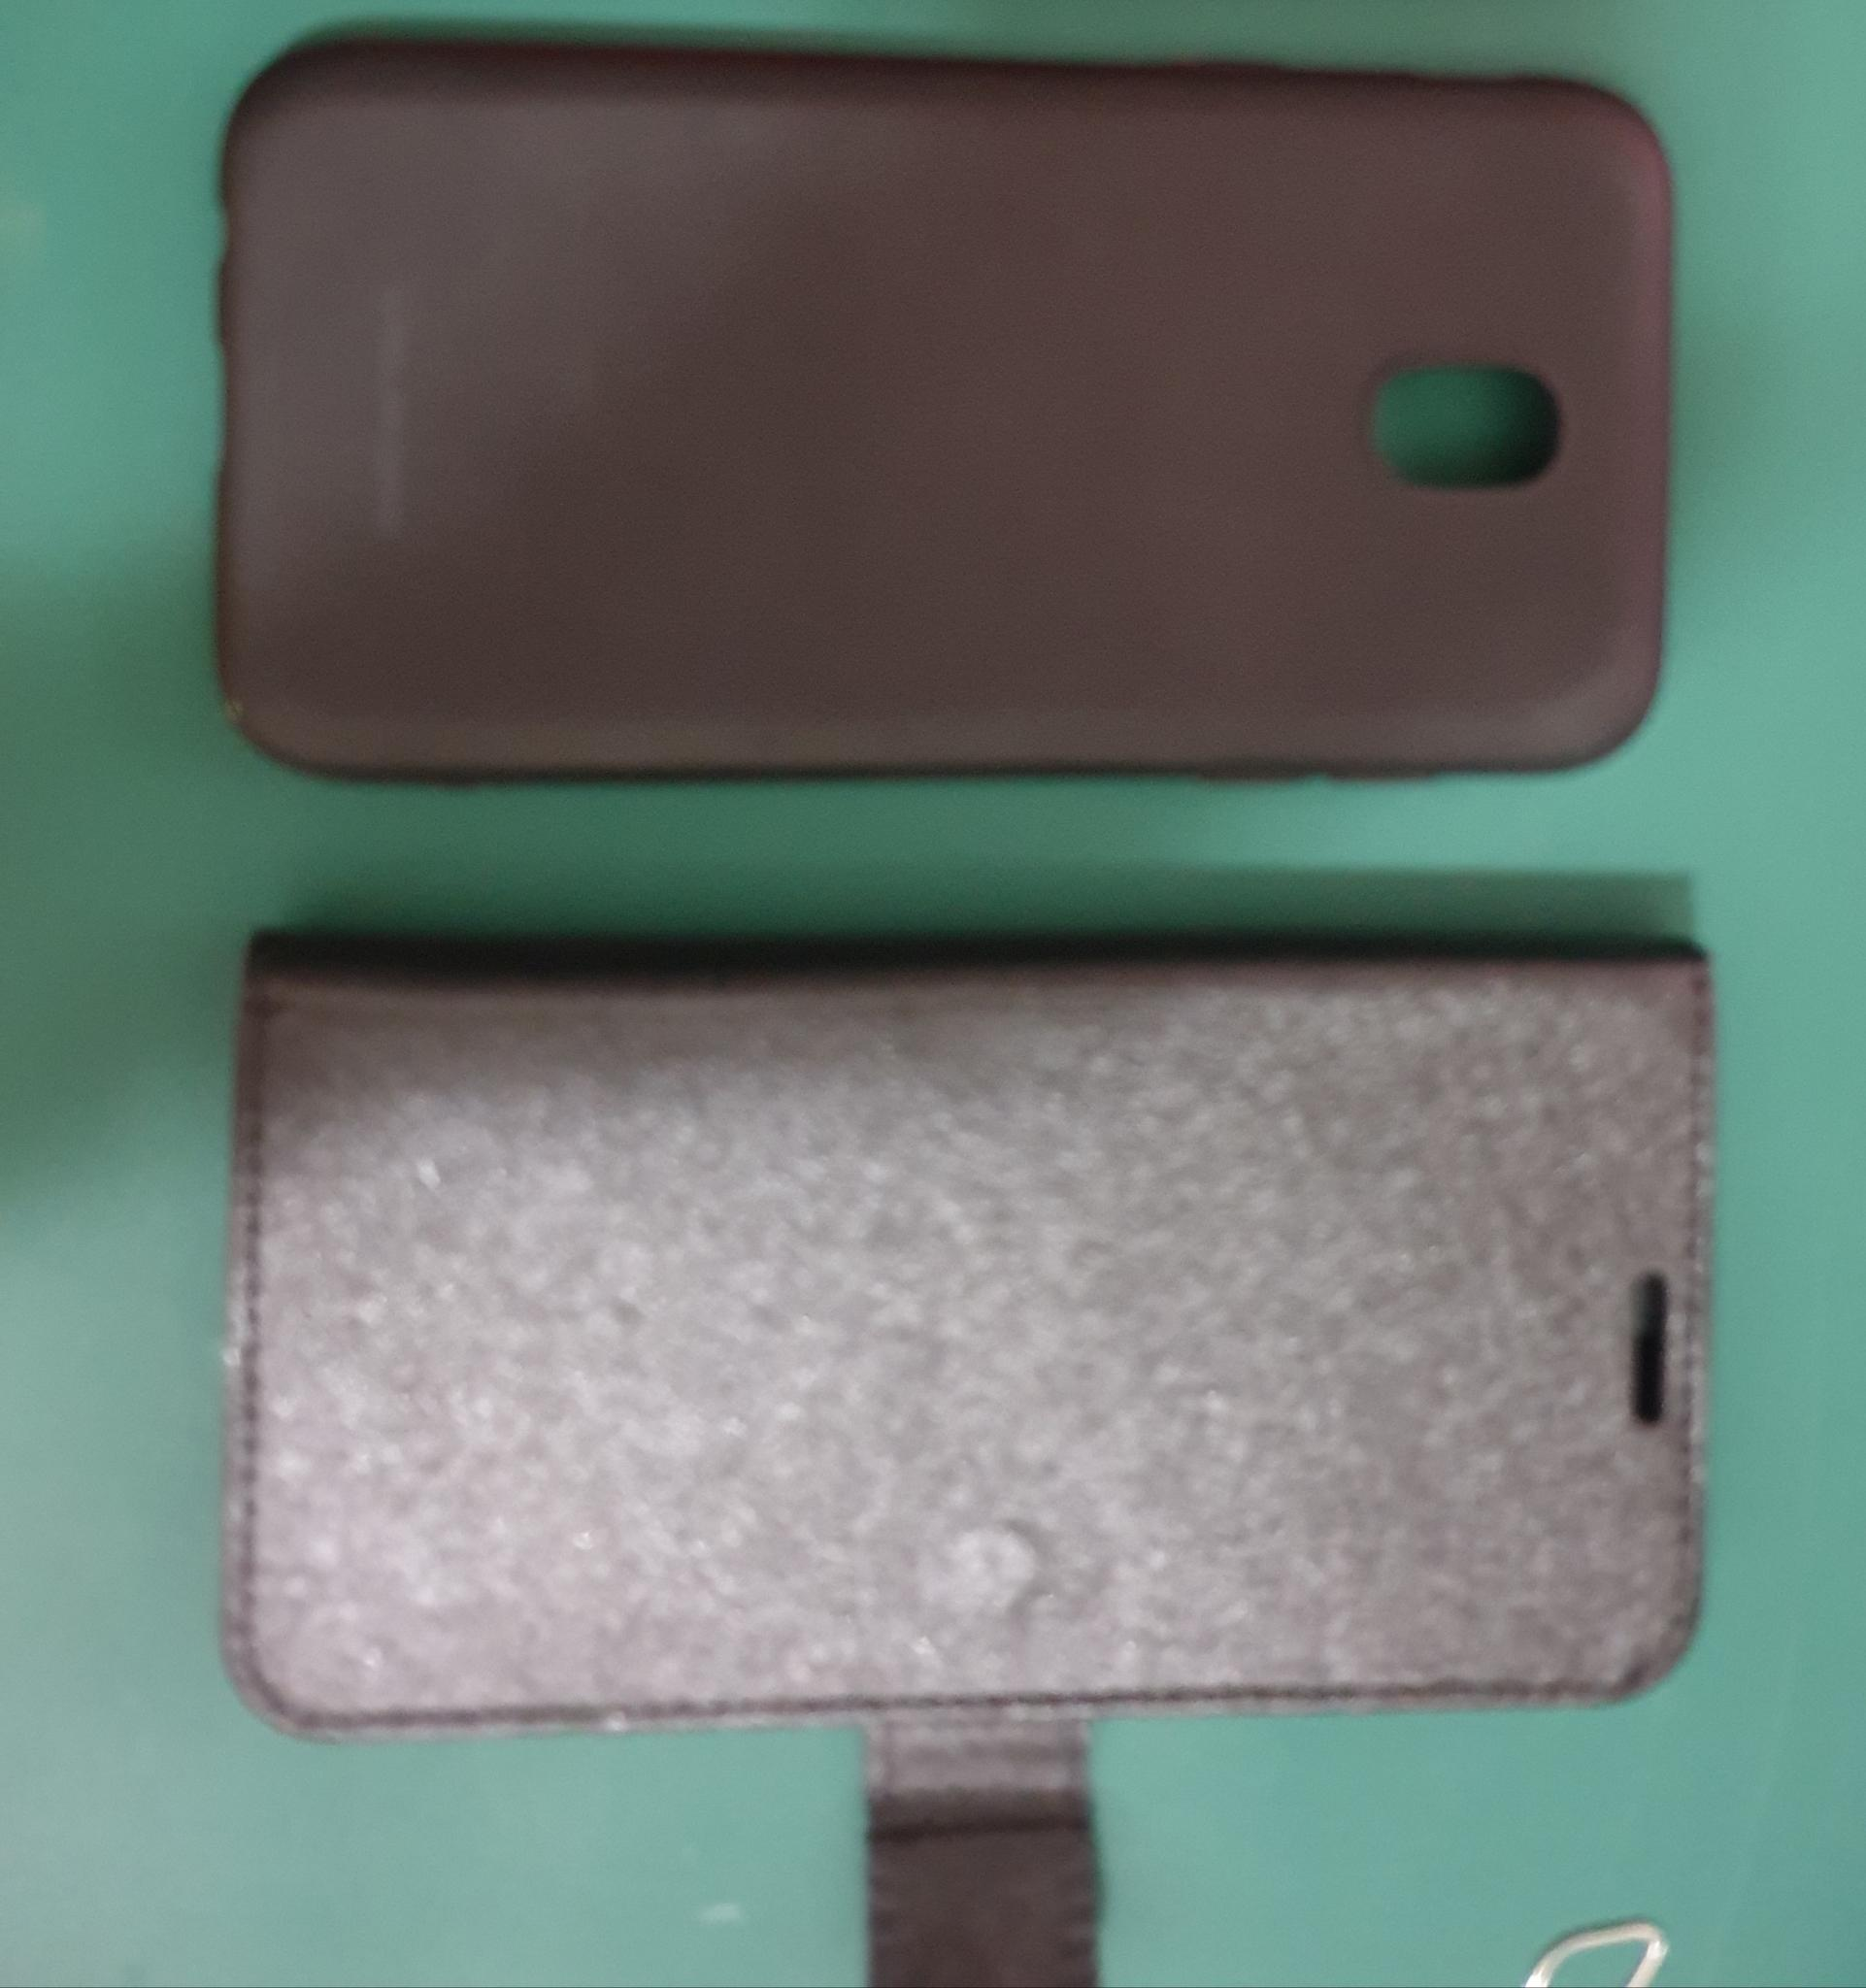 Samsung J5 pro phone covers